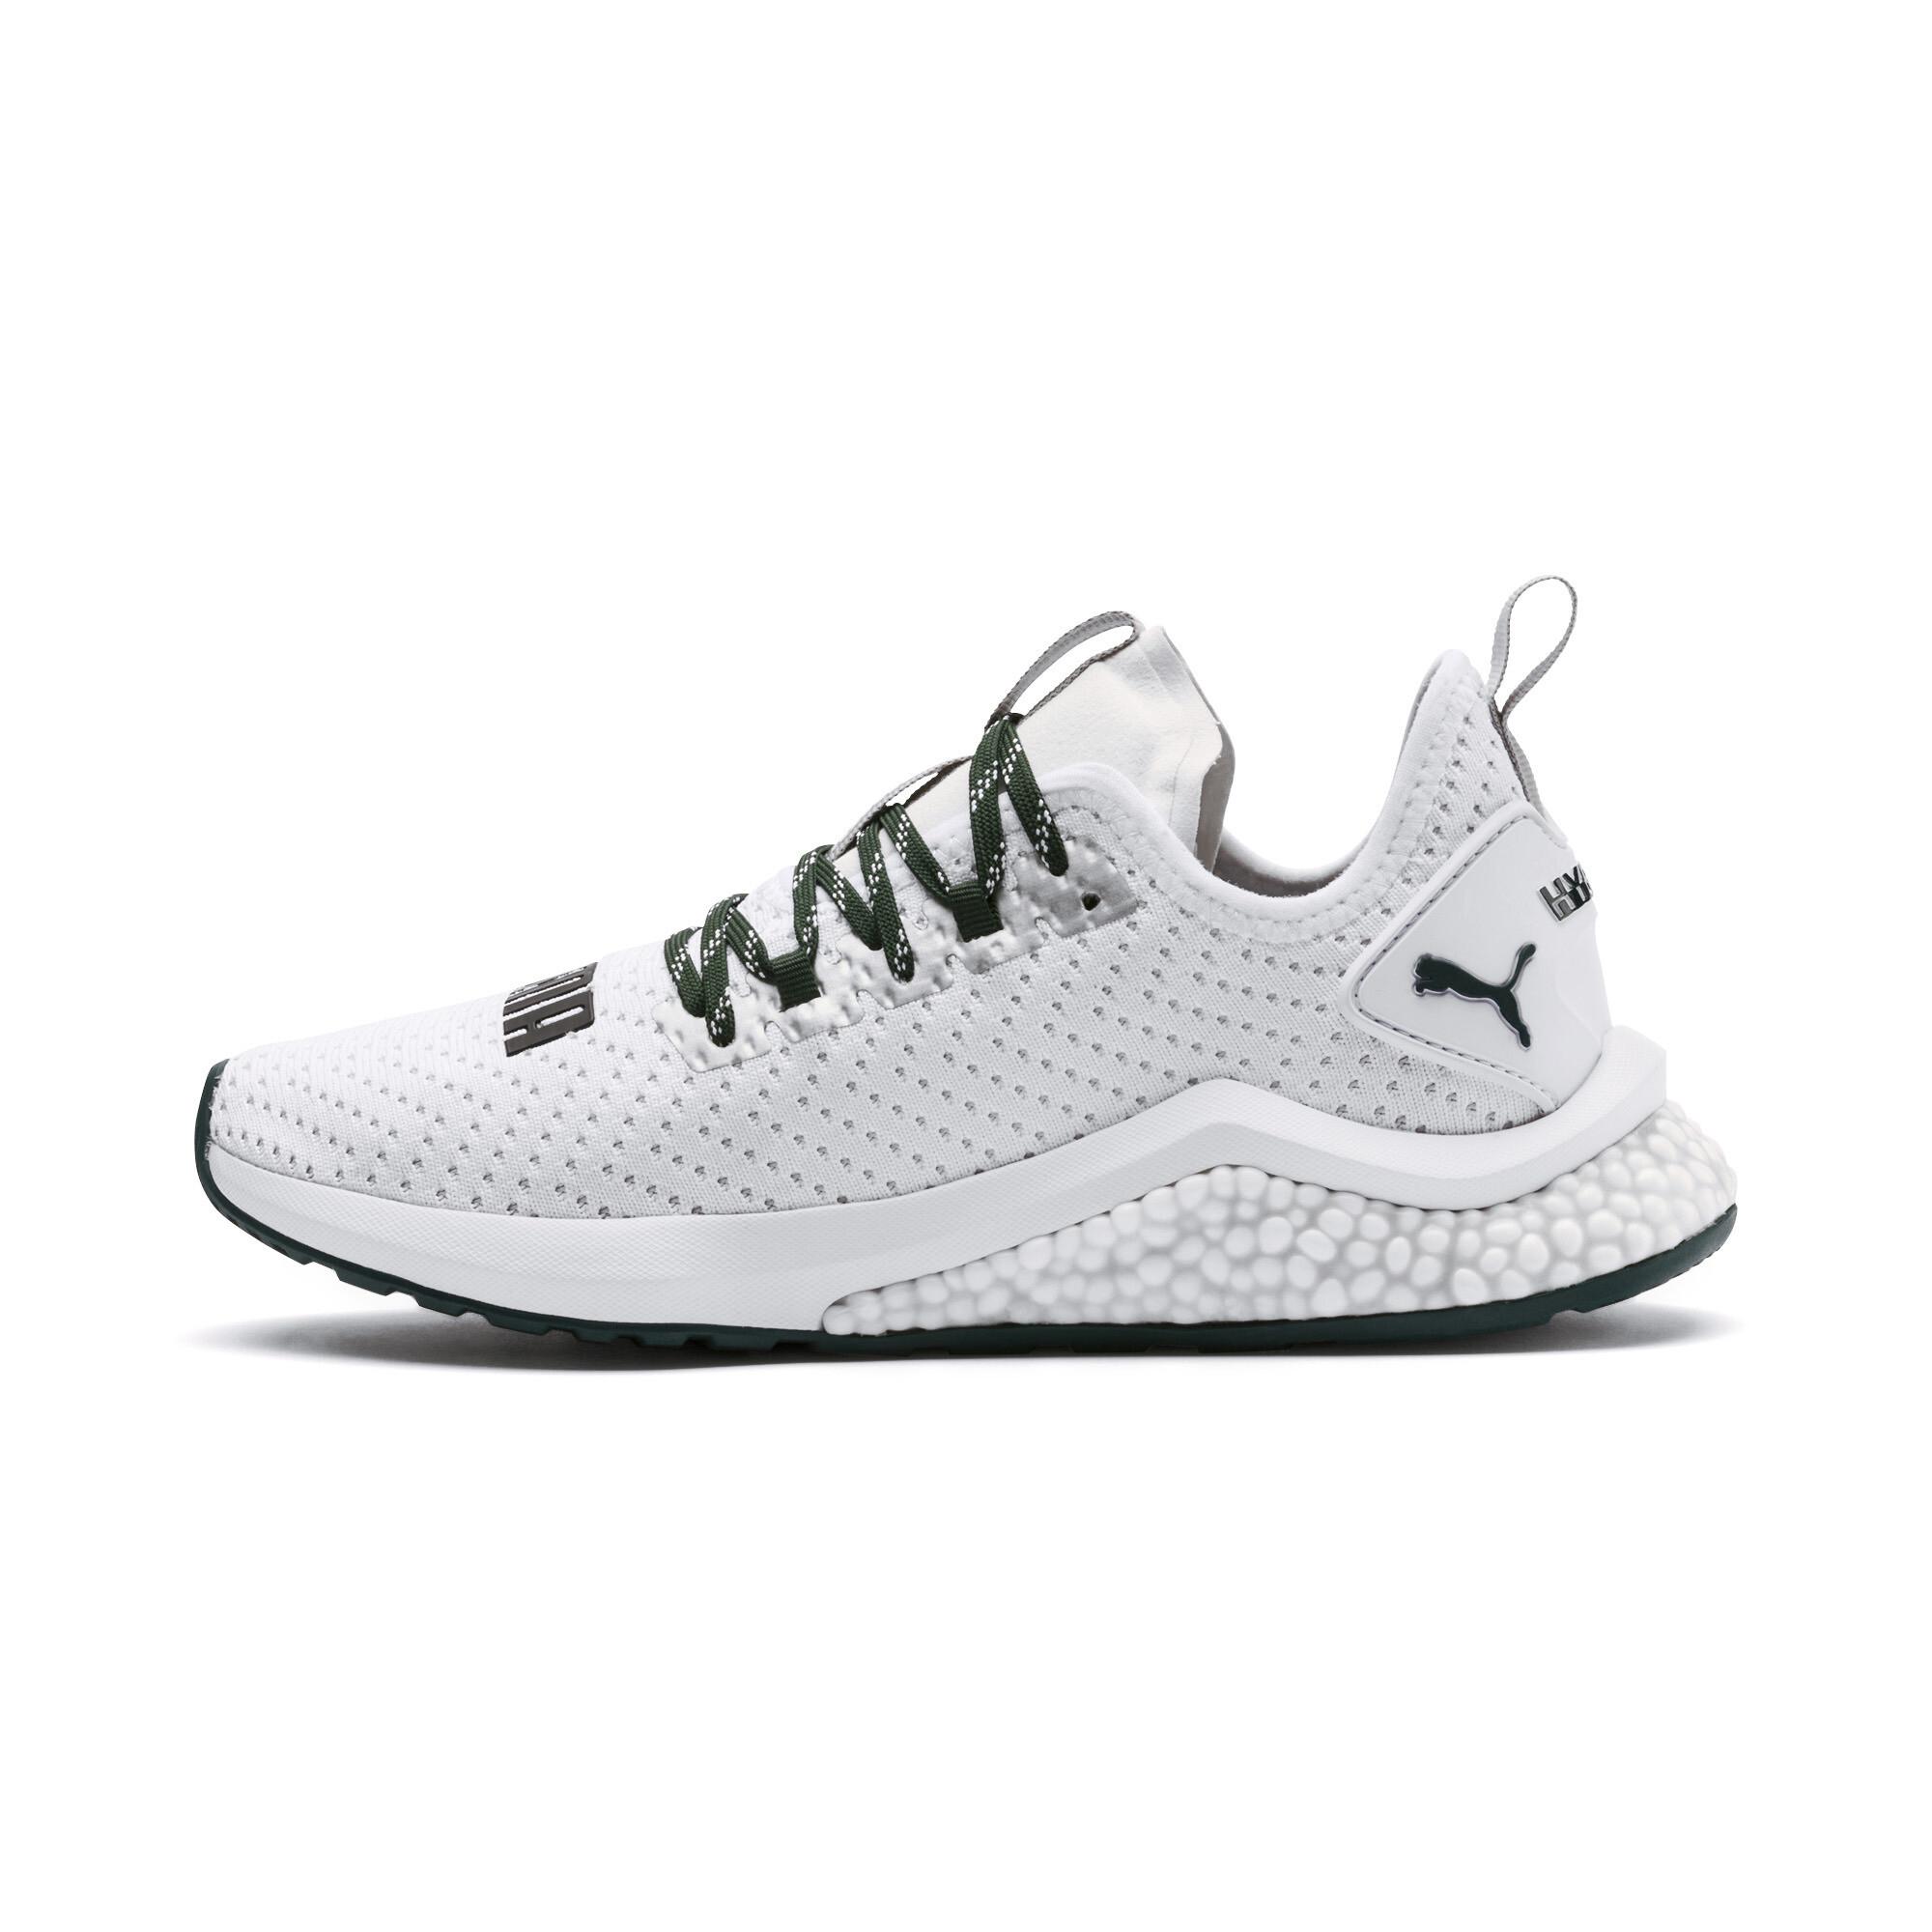 5506deba744 HYBRID NX TZ Women's Running Shoes | 20 - White | Puma